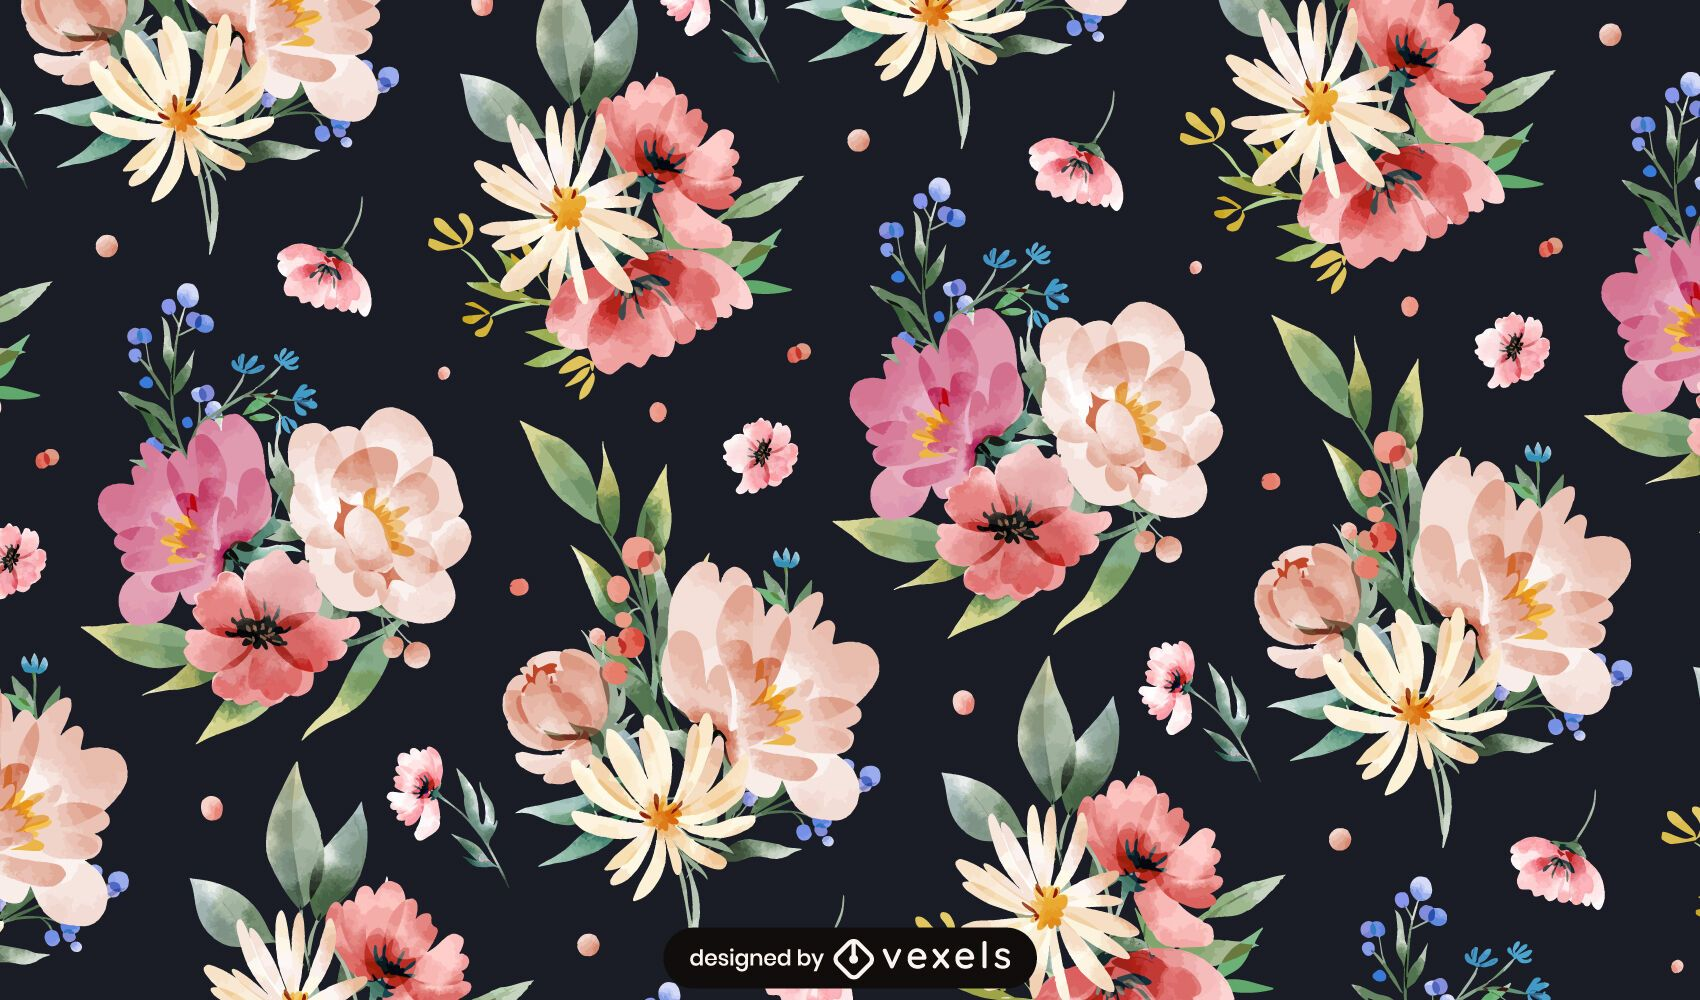 Watercolor spring flowers pattern design